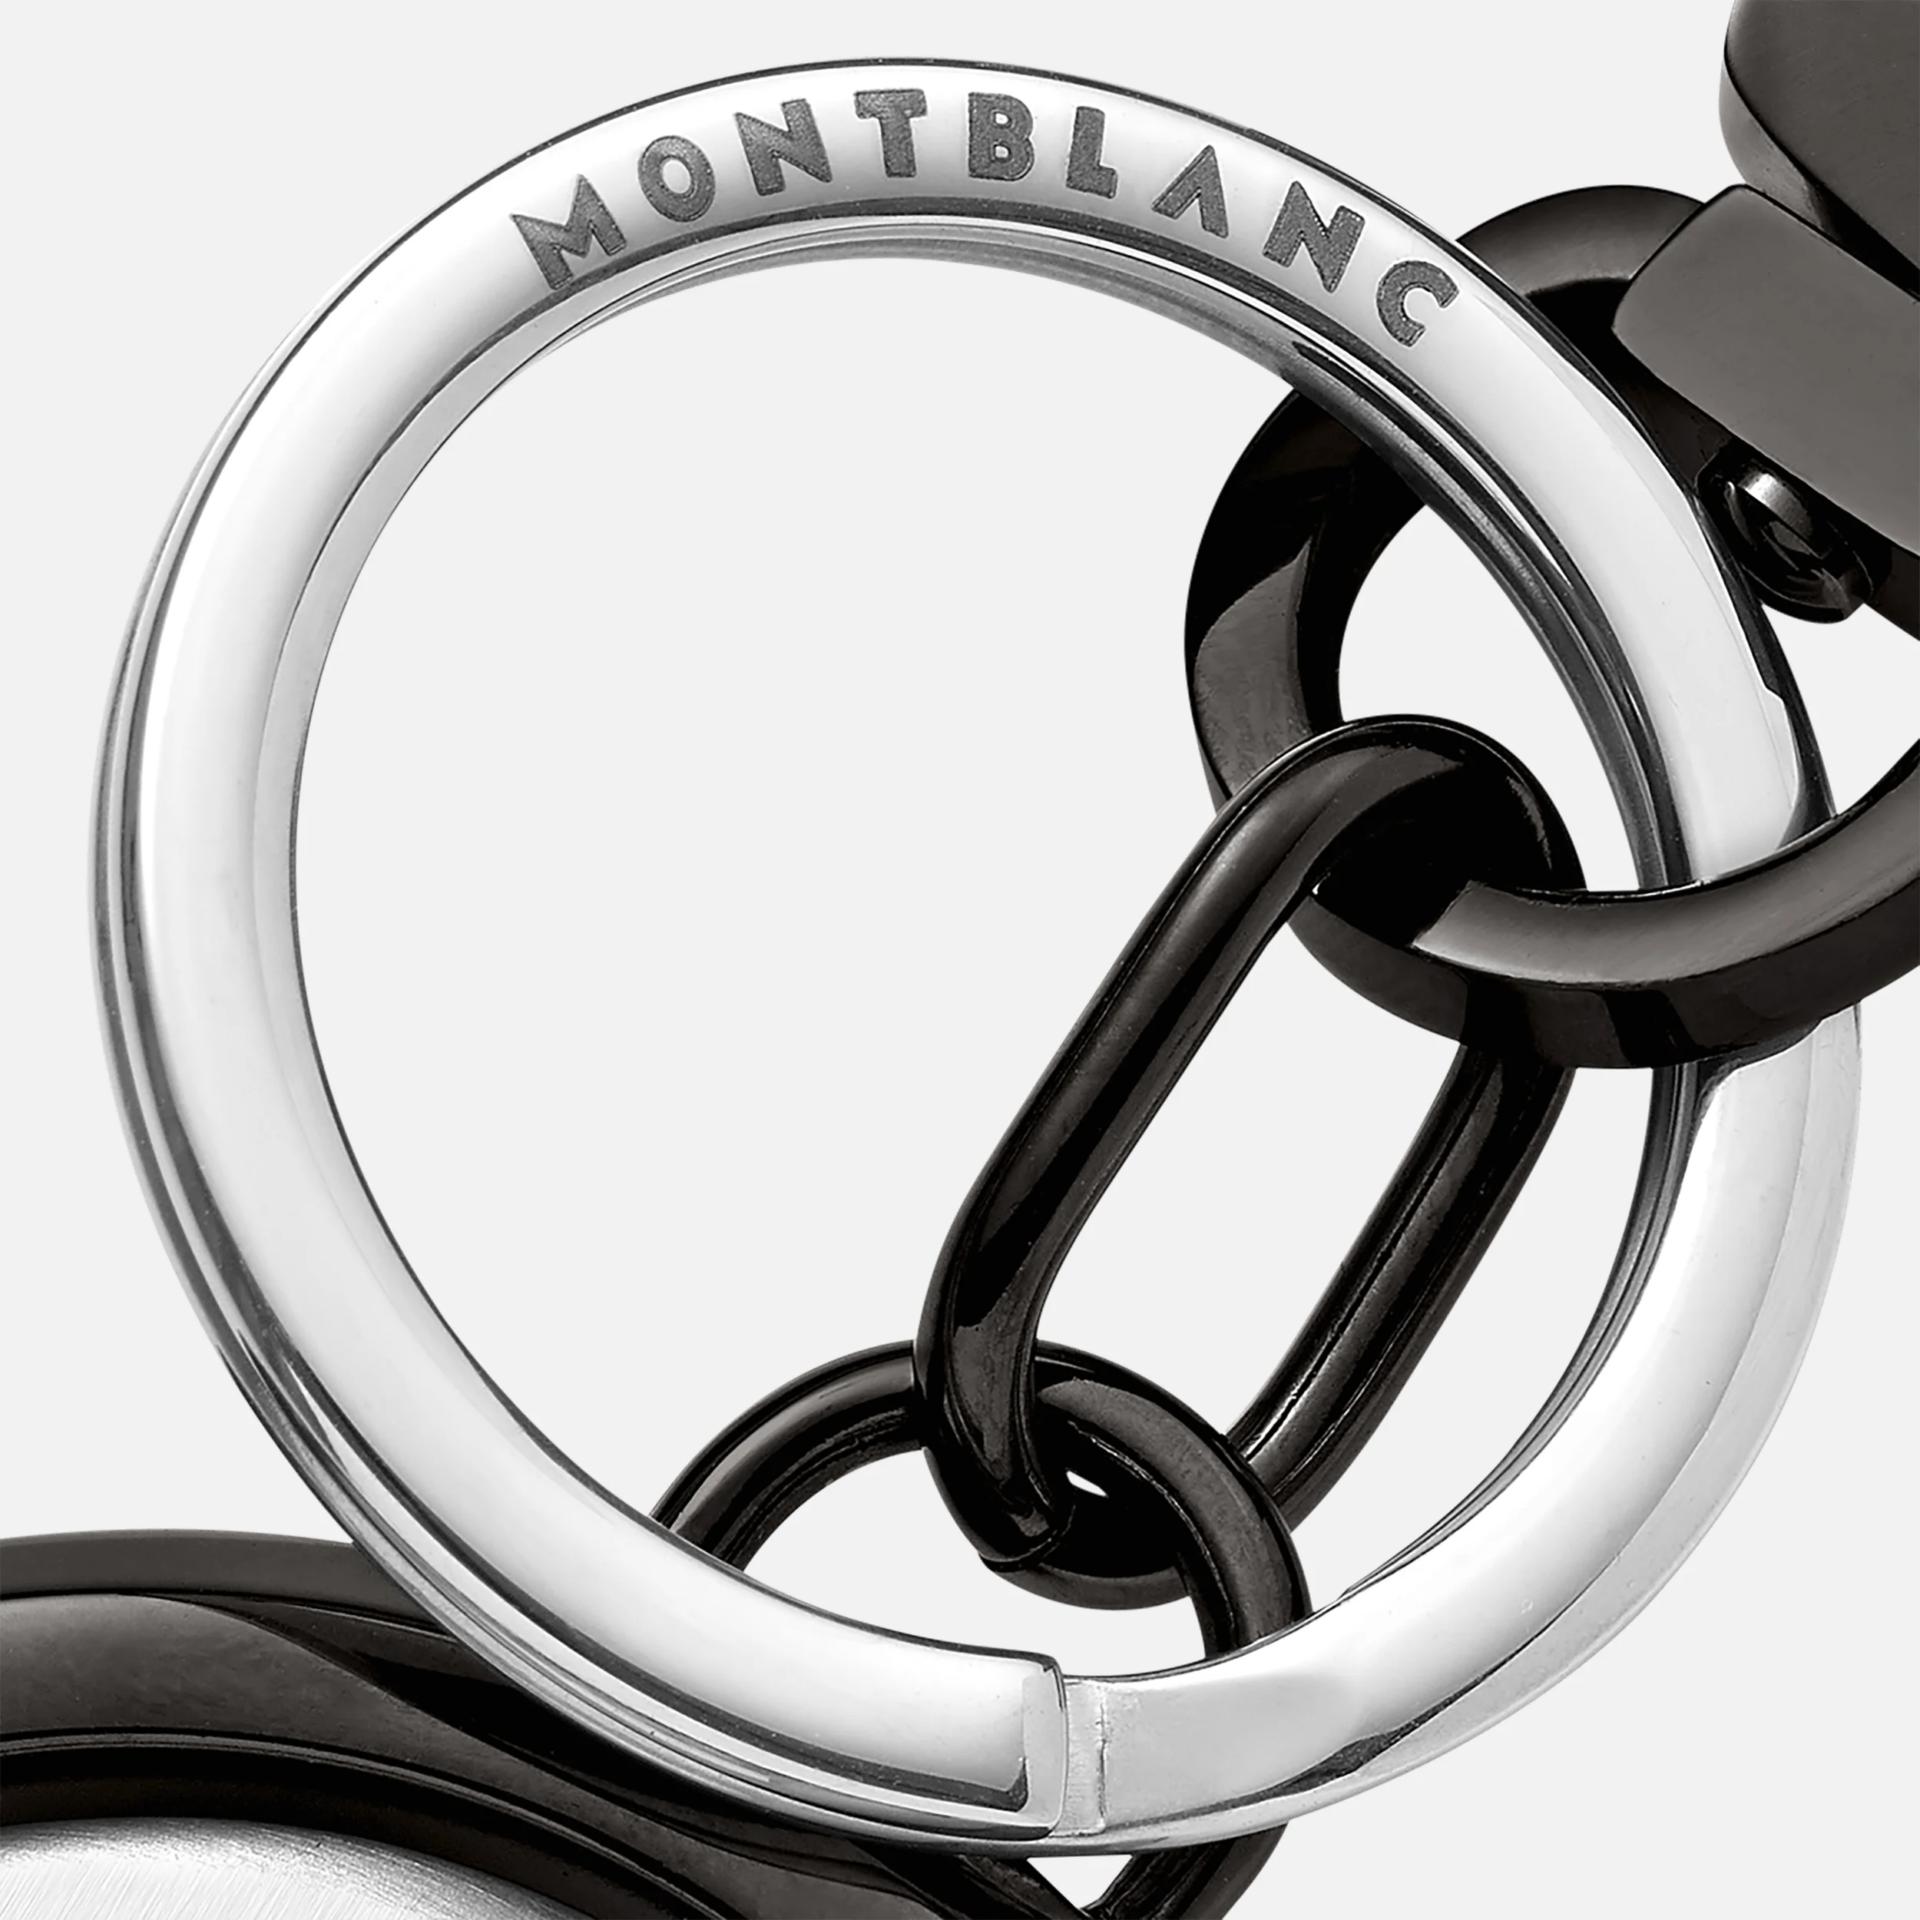 Porte-clés Meisterstück Spinning Emblem noir, Montblanc